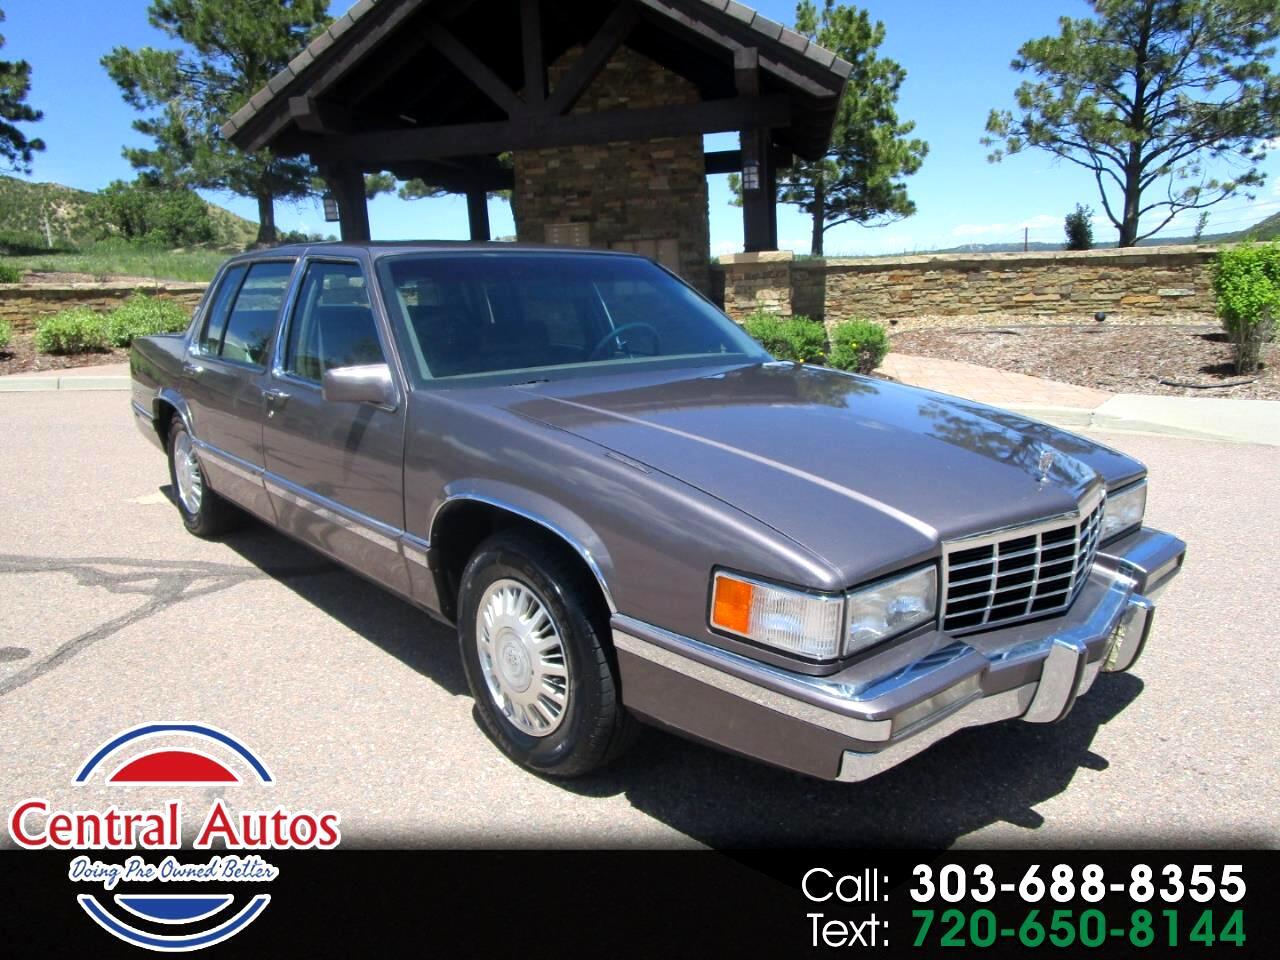 1993 Cadillac DeVille 4dr Sedan